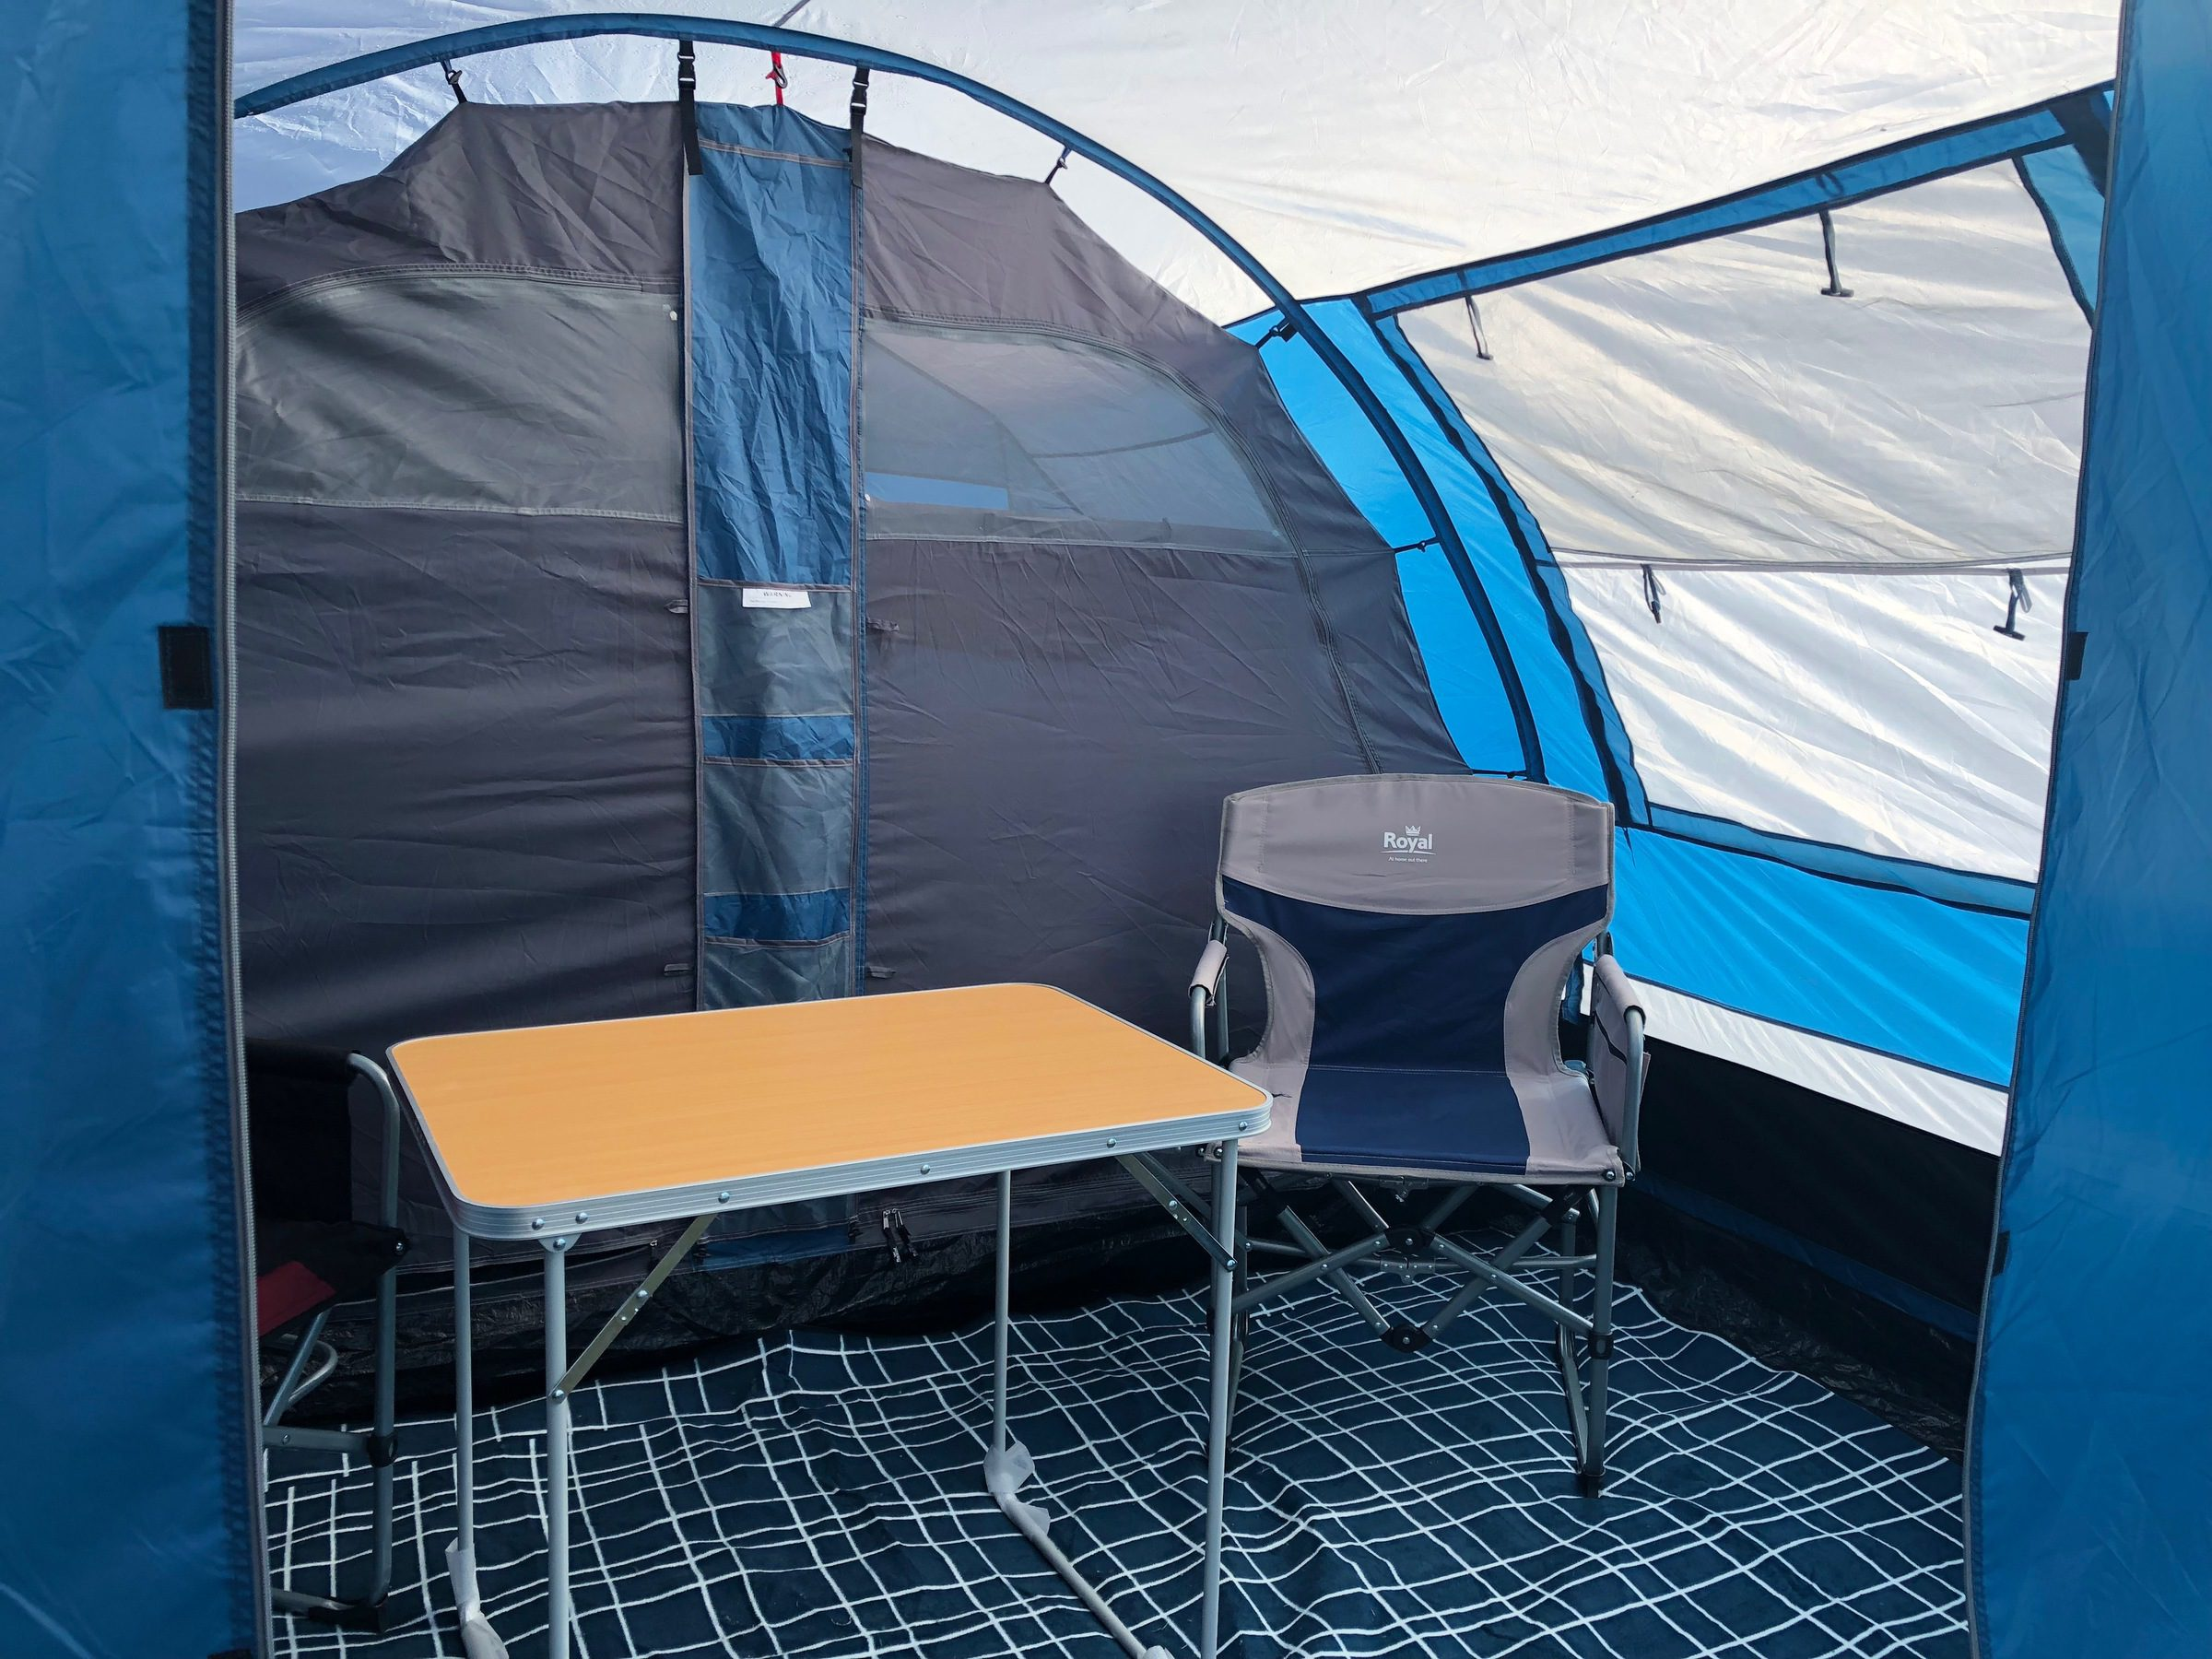 Royal Welford 4 Tent